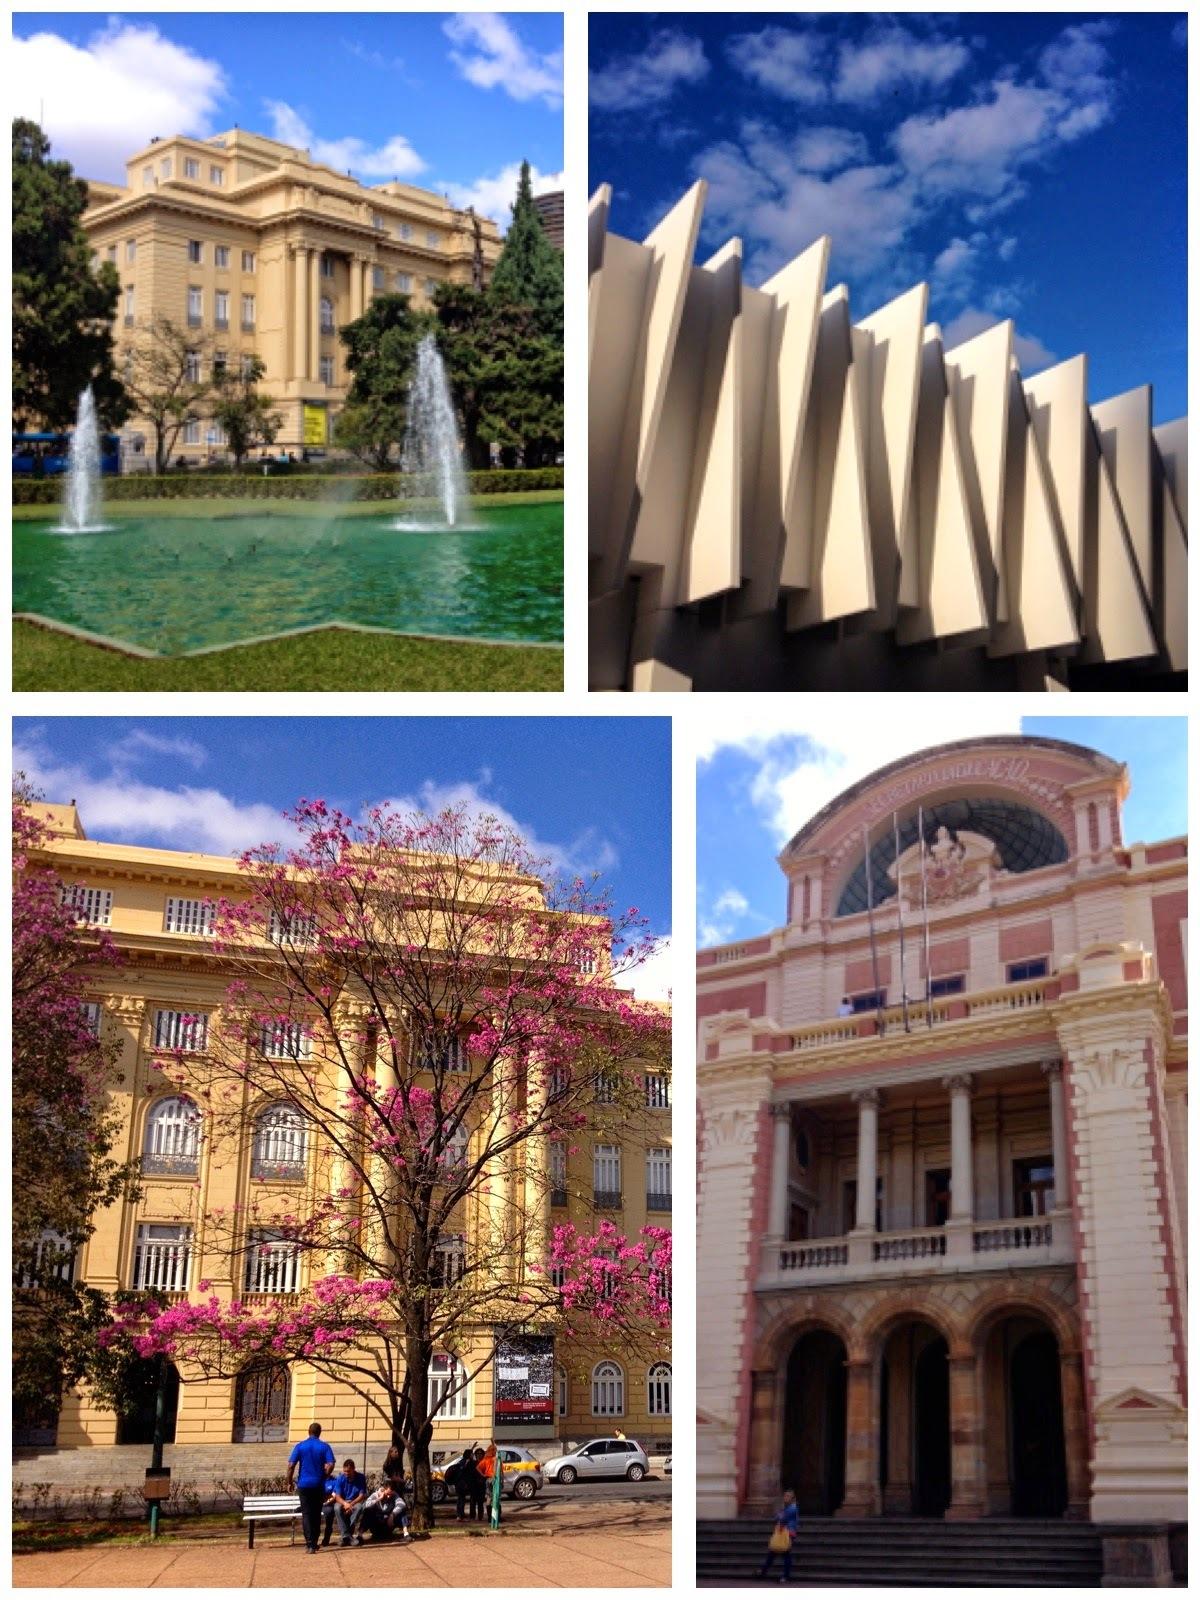 De viaje por Brasil - Parte III: Belo Horizonte